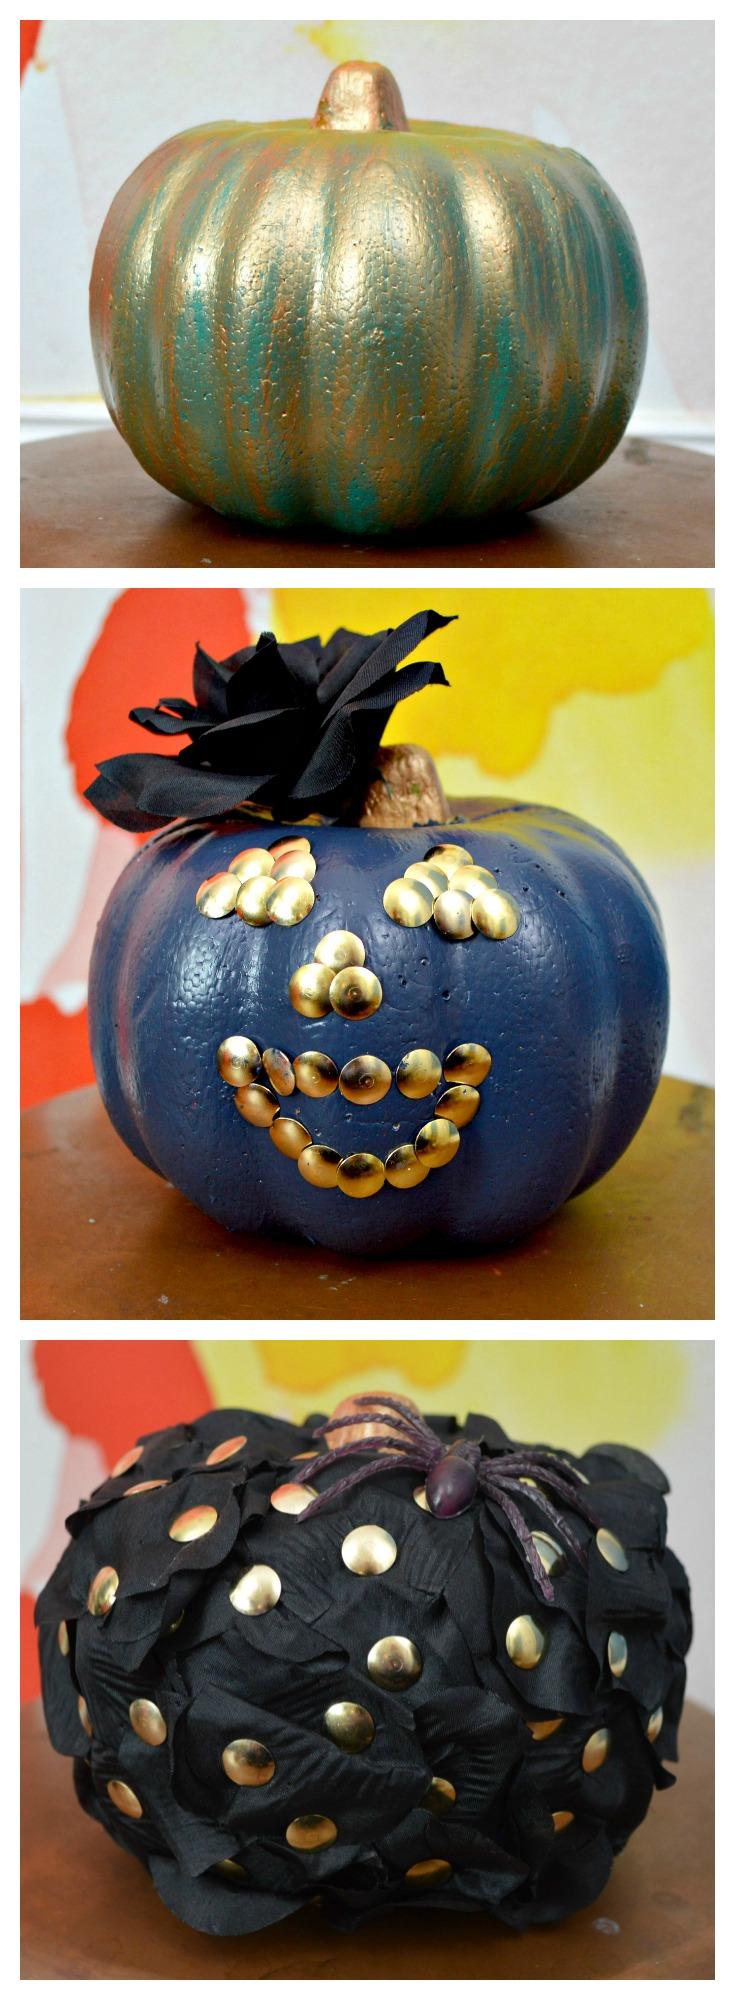 How to store pumpkins - 3 Dollar Store Pumpkin Makeovers